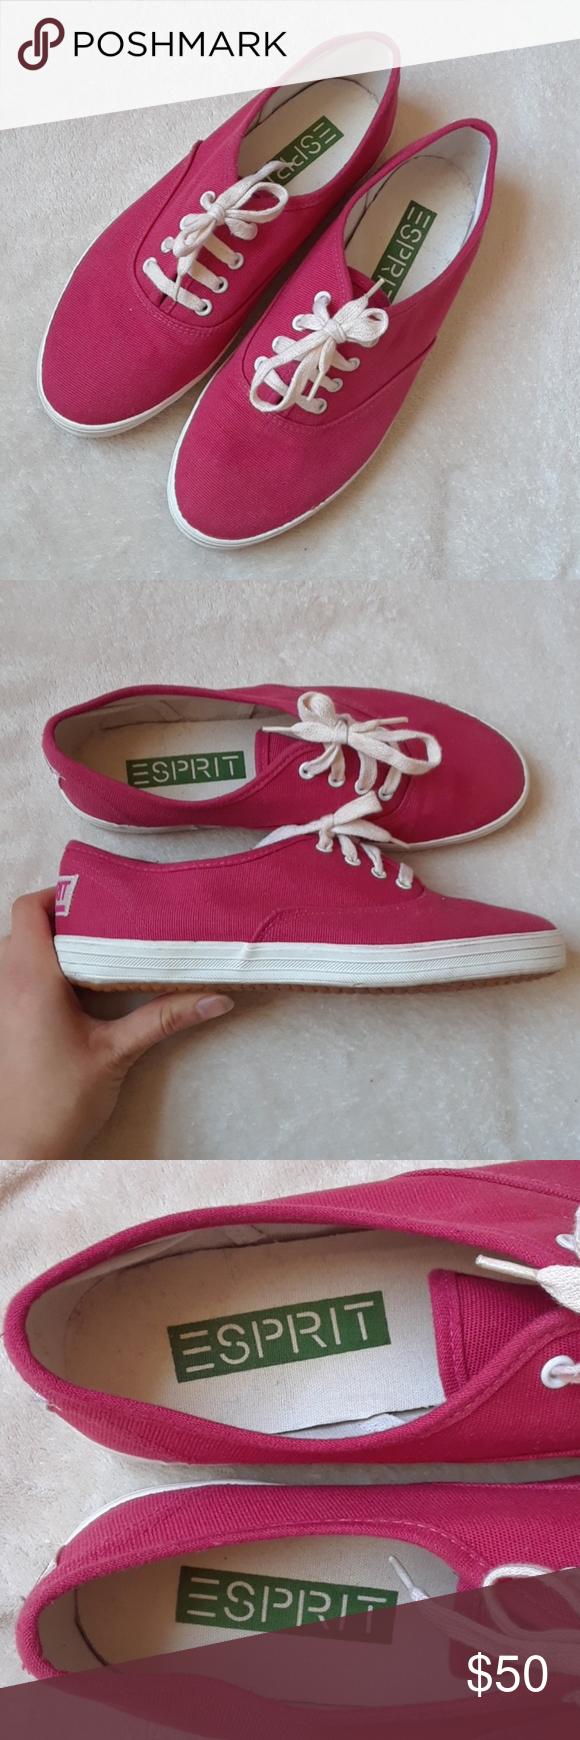 Esprit platform sneakers pink esprit tennis shoes in perfect condition  esprit shoes sneakers png 580x1740 Esprit 2ad0130a5